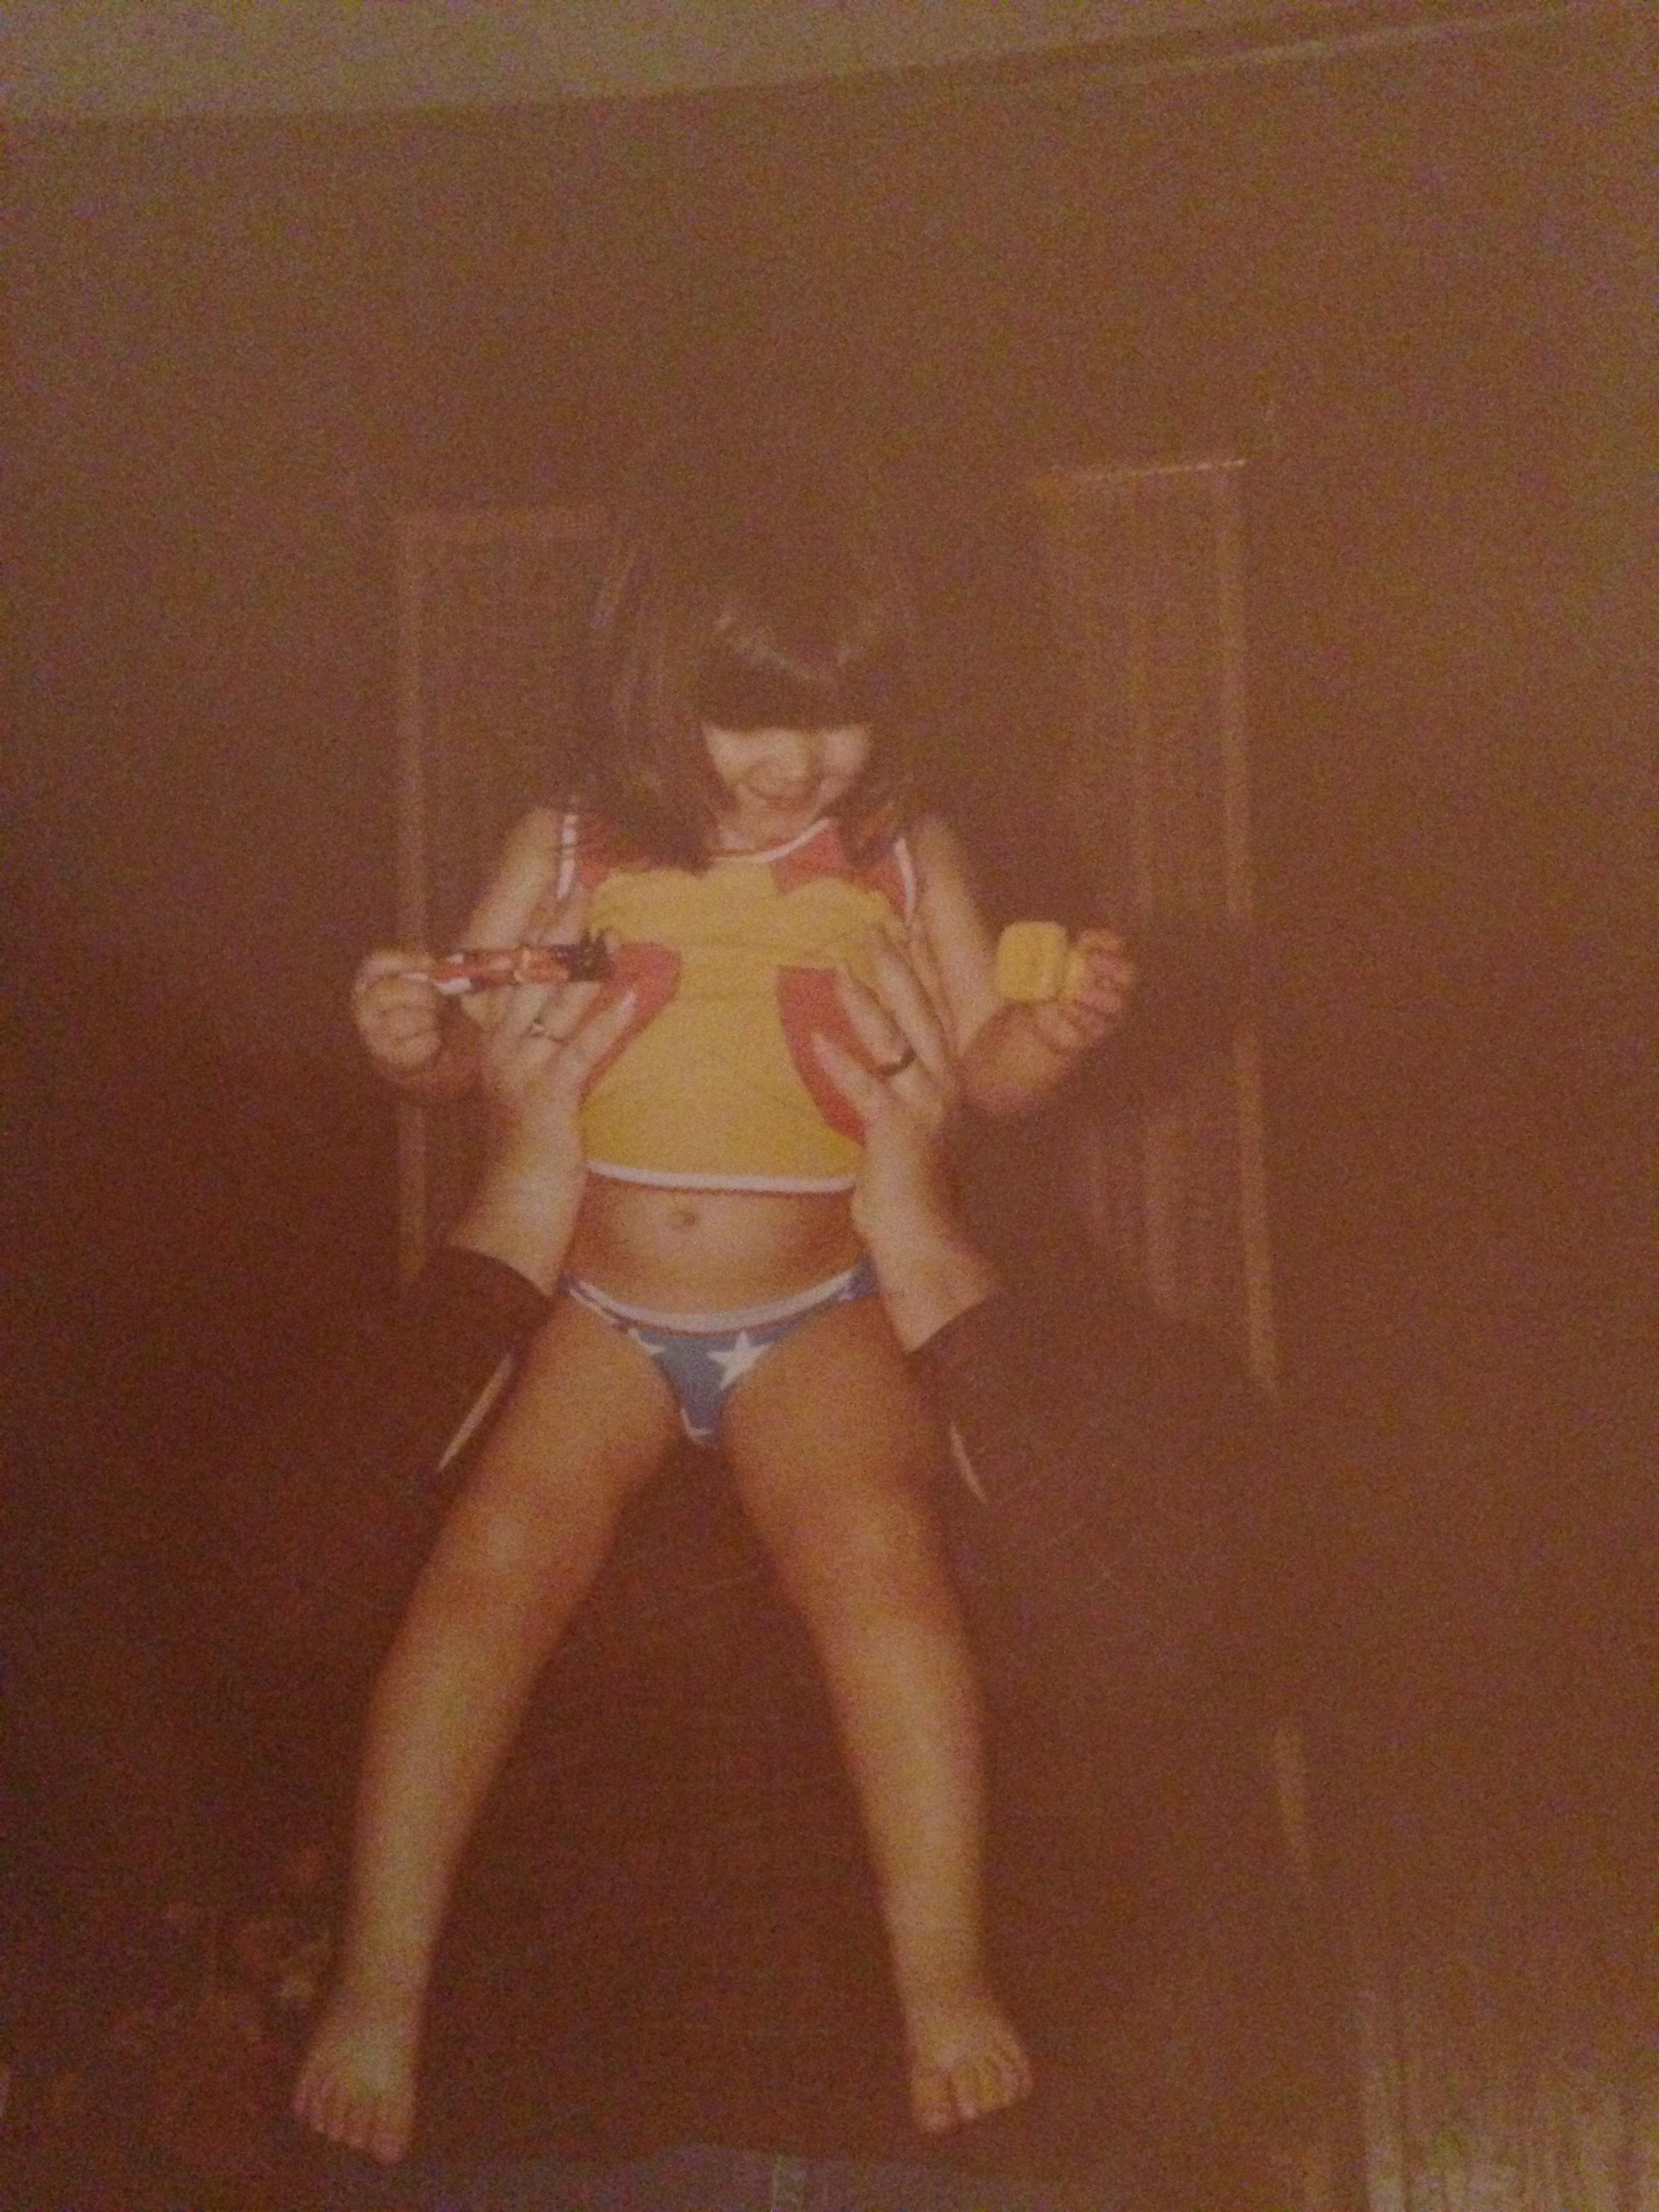 1981. Me, being held aloft by my mother wearing the Wonder Woman underoos of Legend.